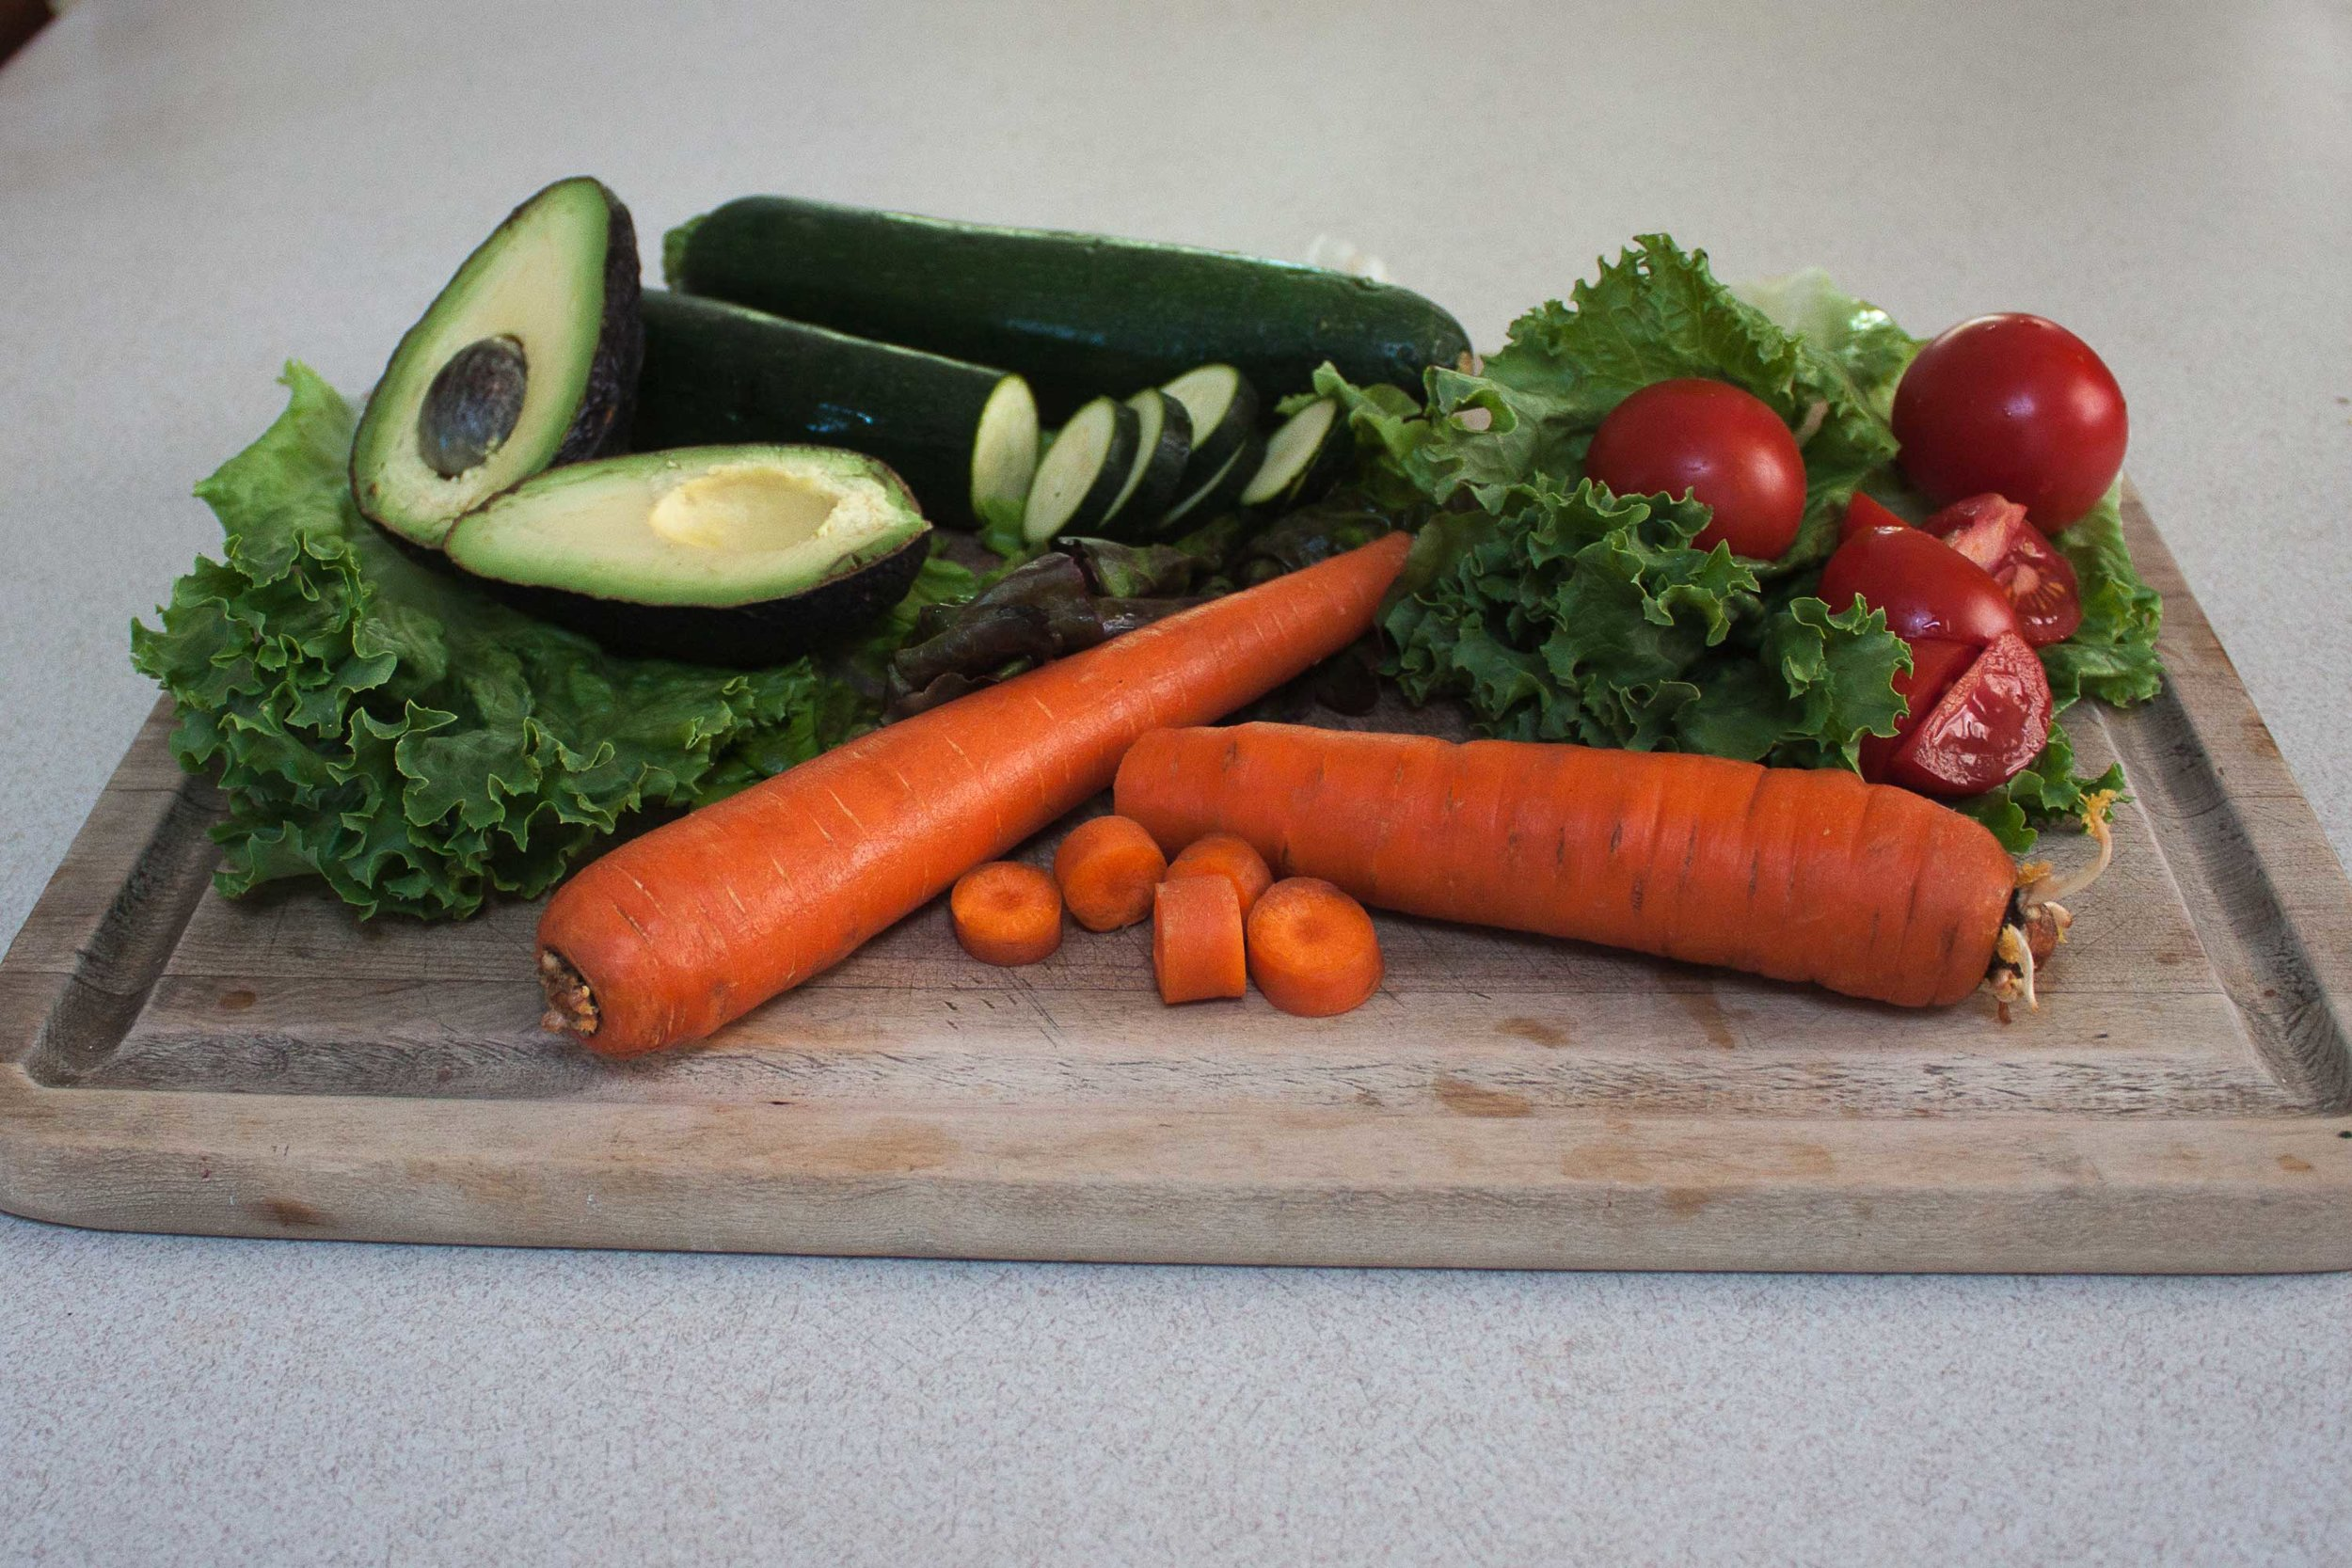 Dinner-ISO-200-f_3.5-1_25th-sec.-18mm-focal-length--crop-sensor---Dan-Ford